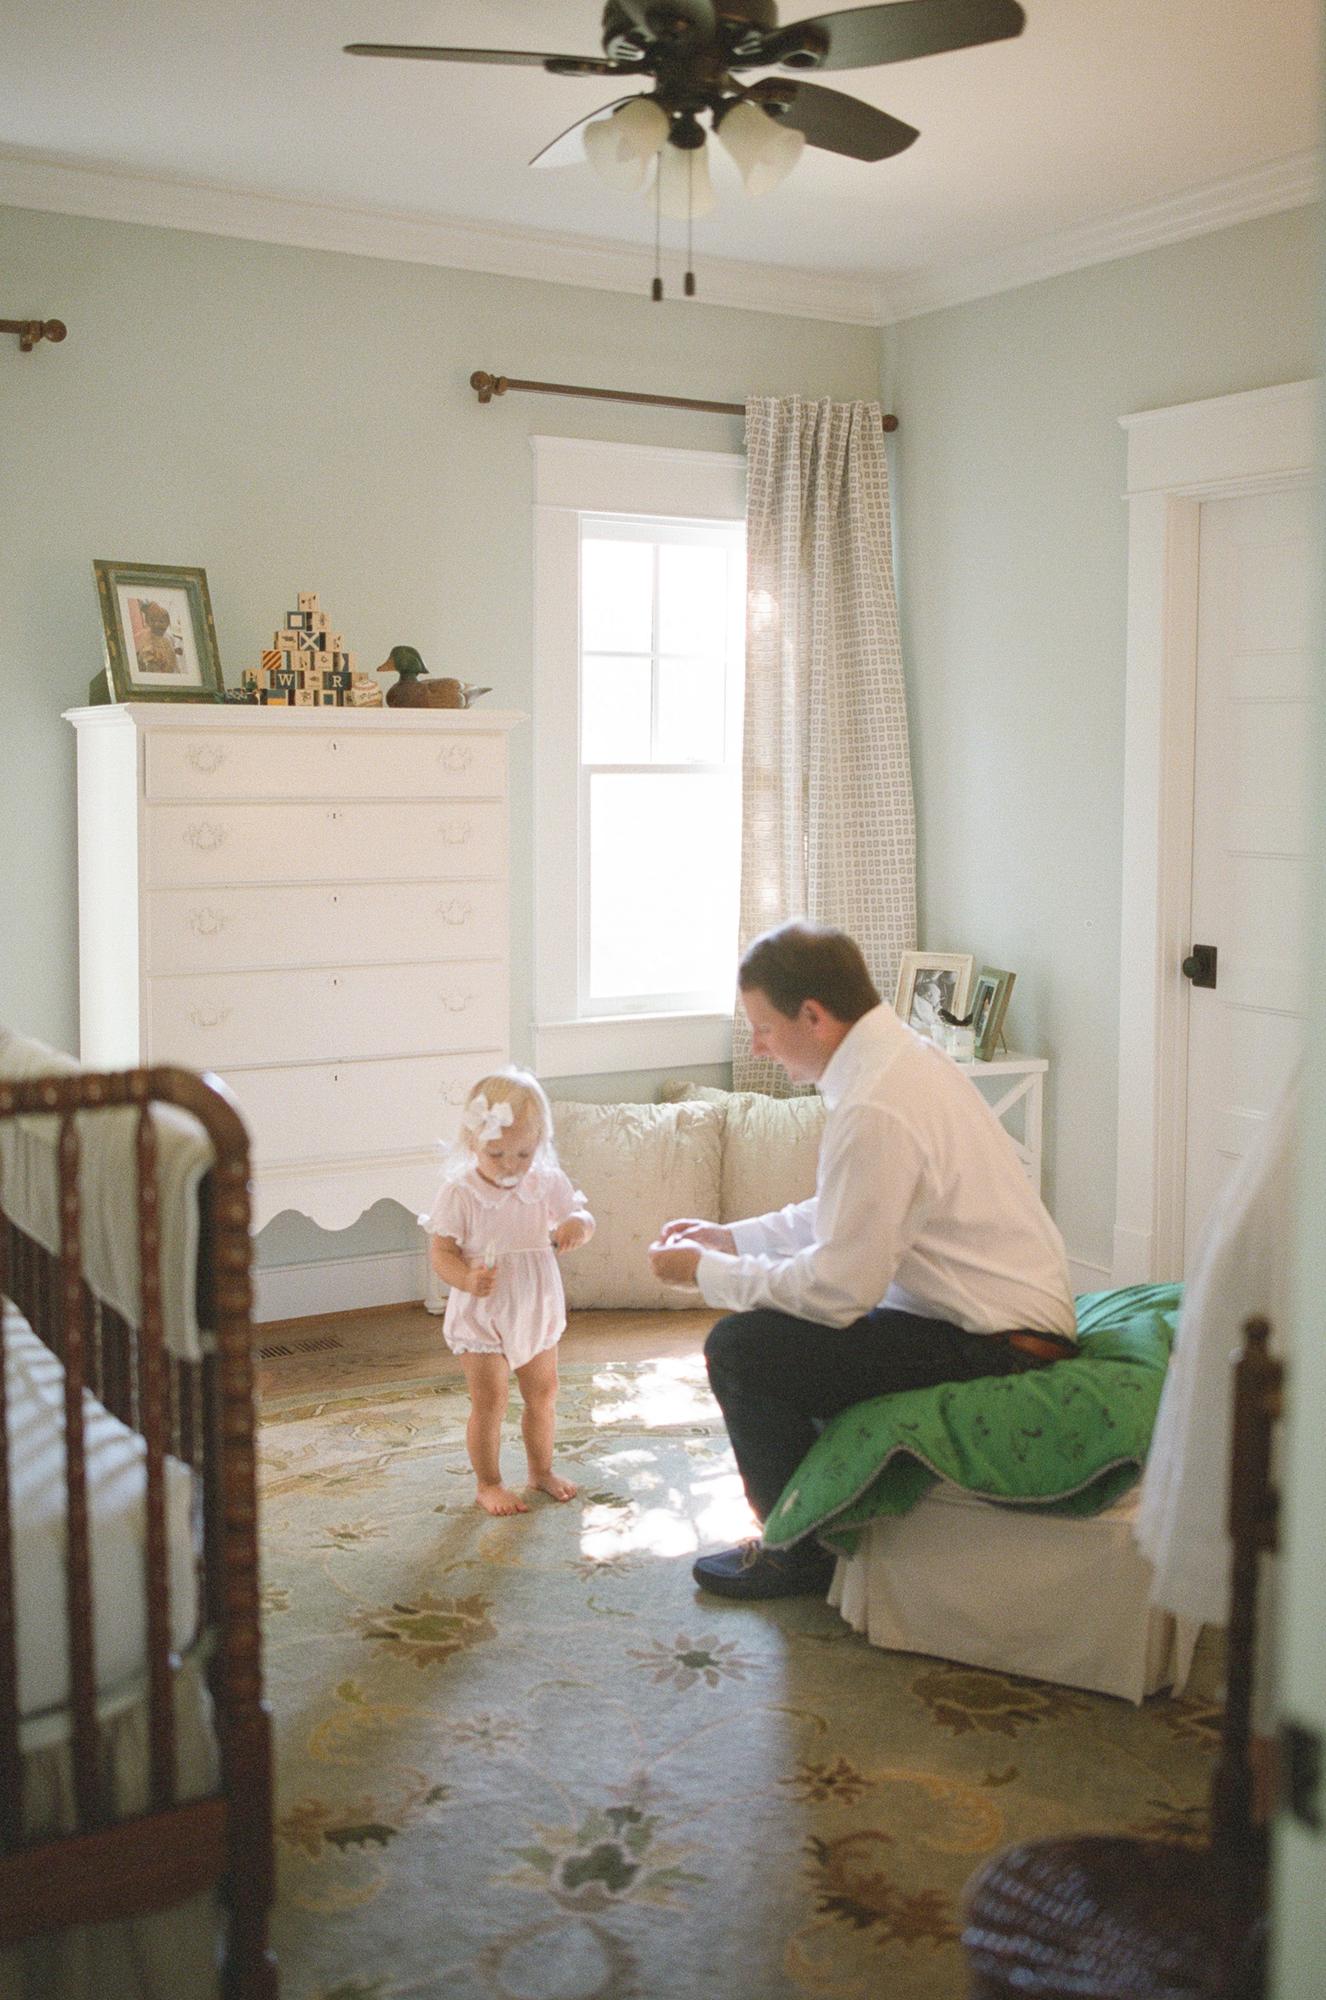 raleigh-newborn-photographer-lifestyle-baby-session-020